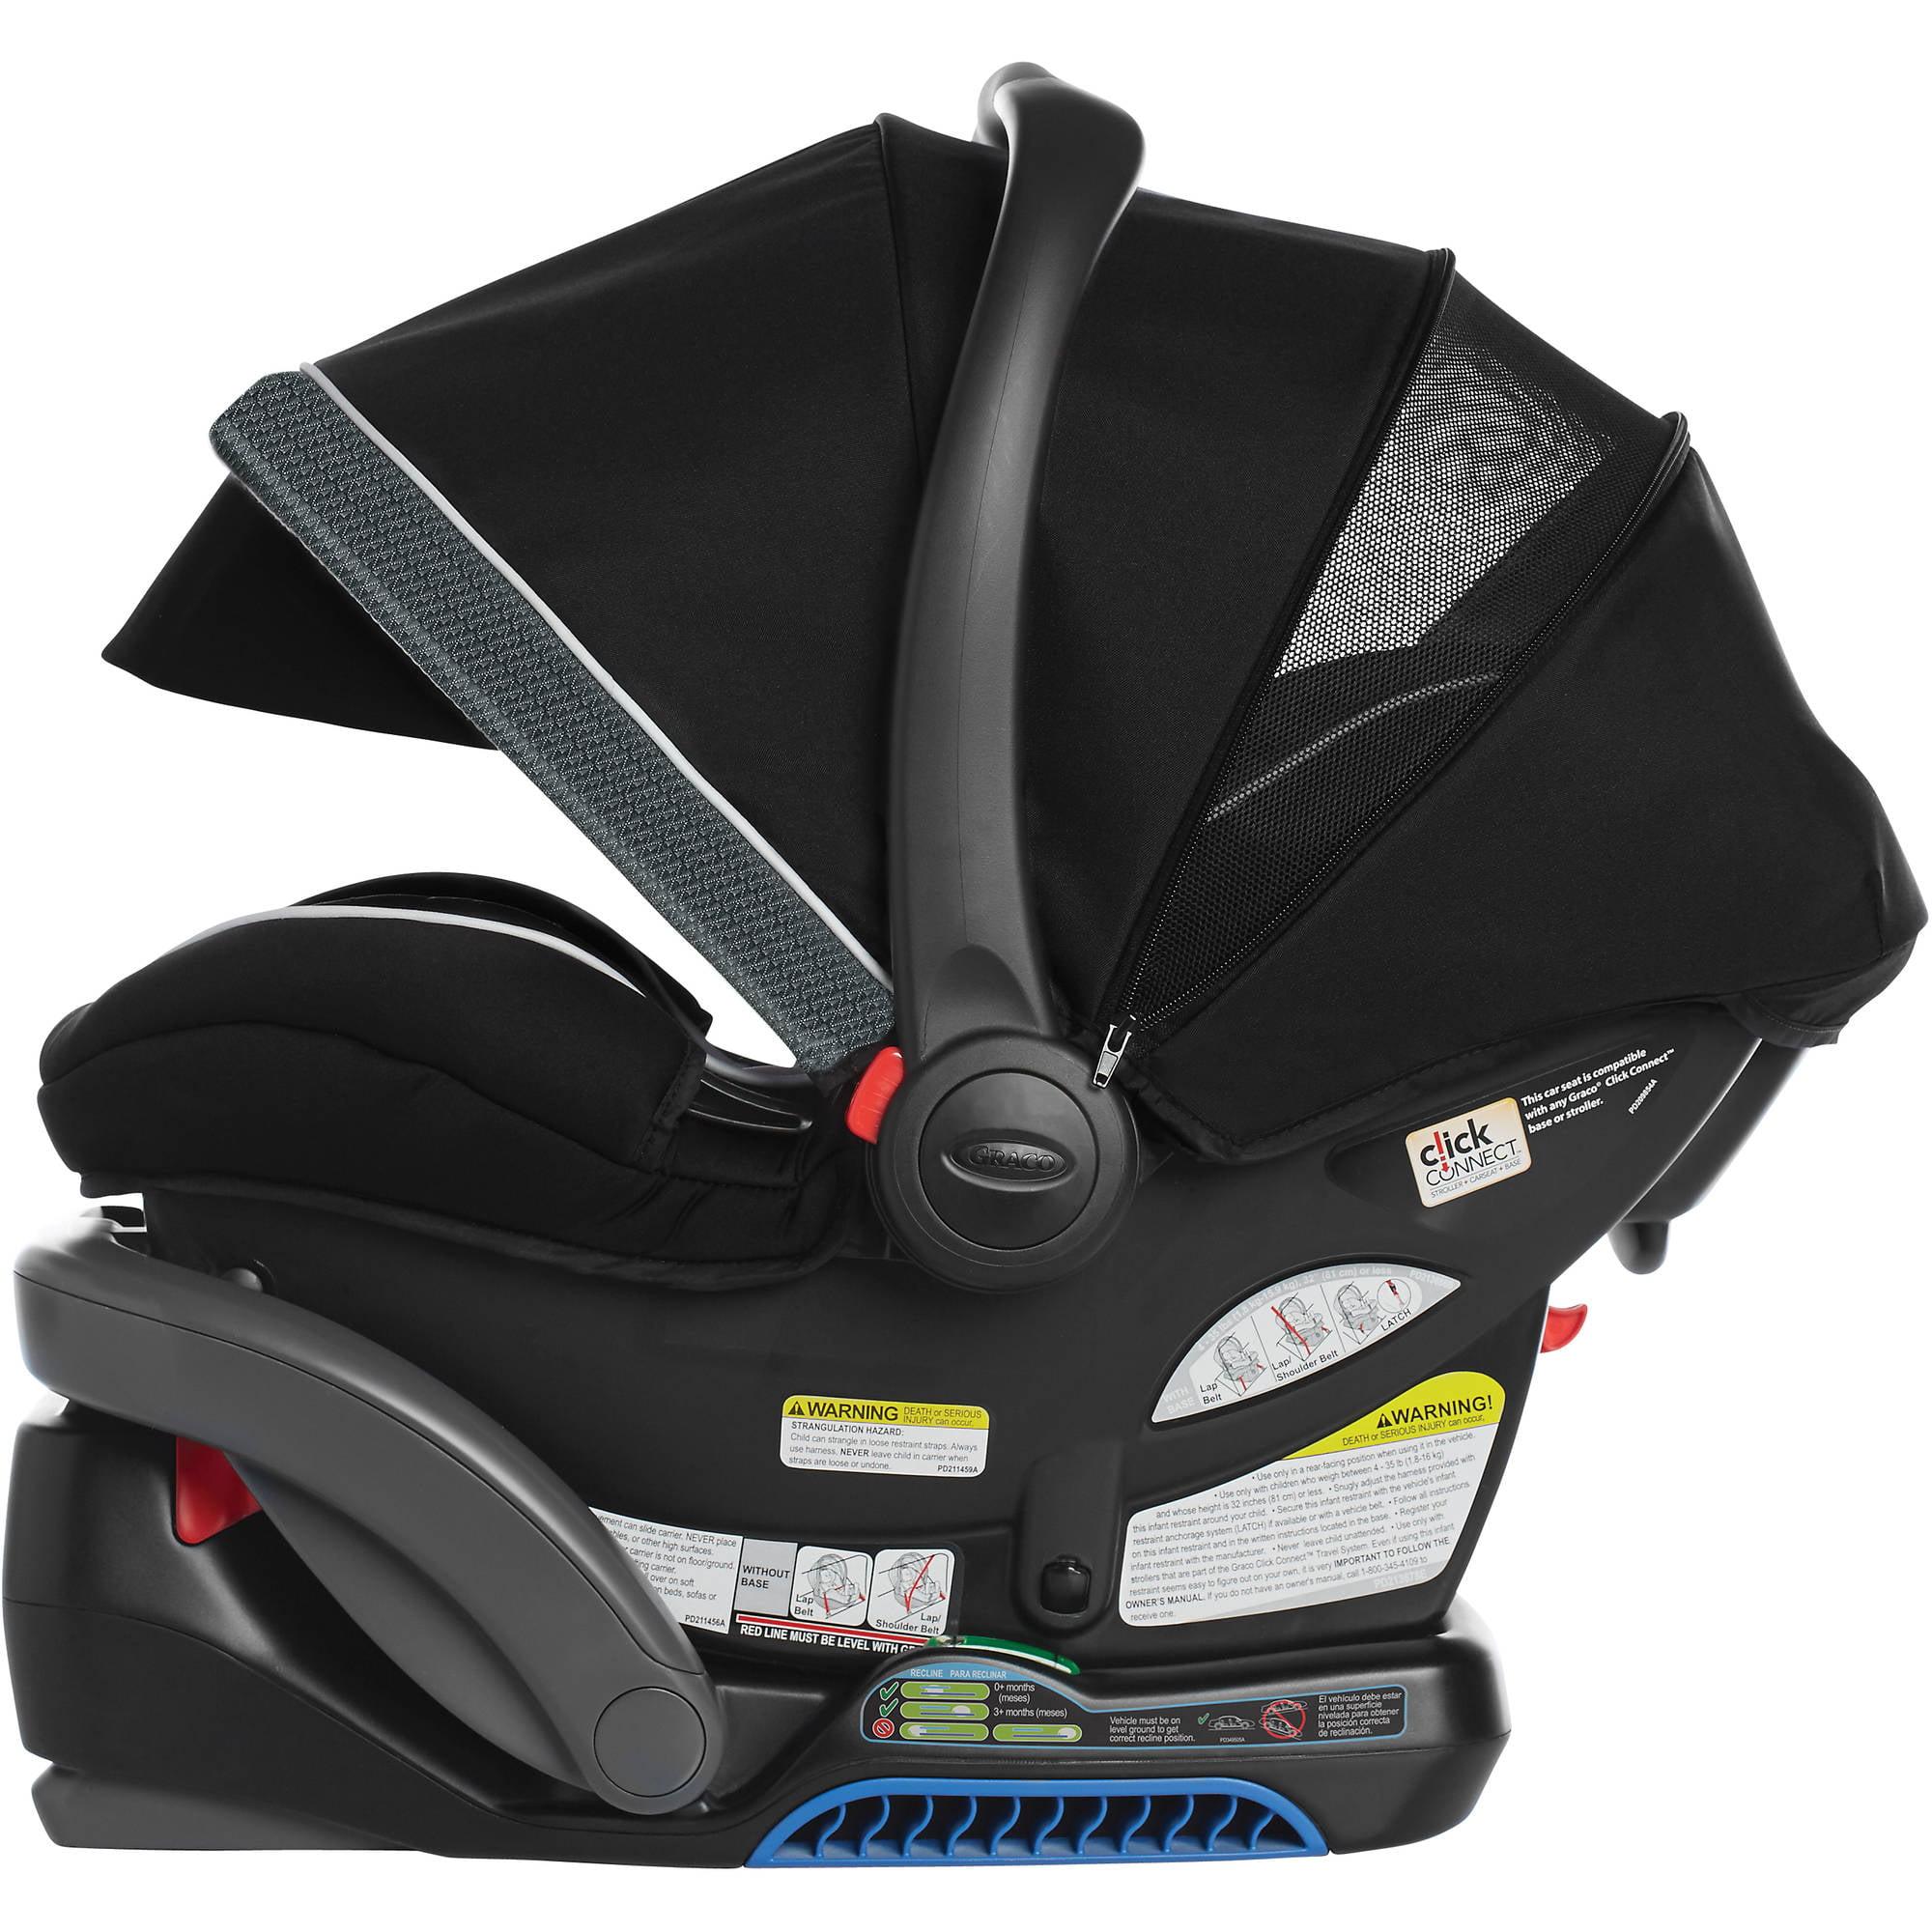 Graco Snugride Snuglock 35 Elite Infant Car Seat Spencer With Nuk Simply Natural 5oz Bottle 1 Pack Walmart Com